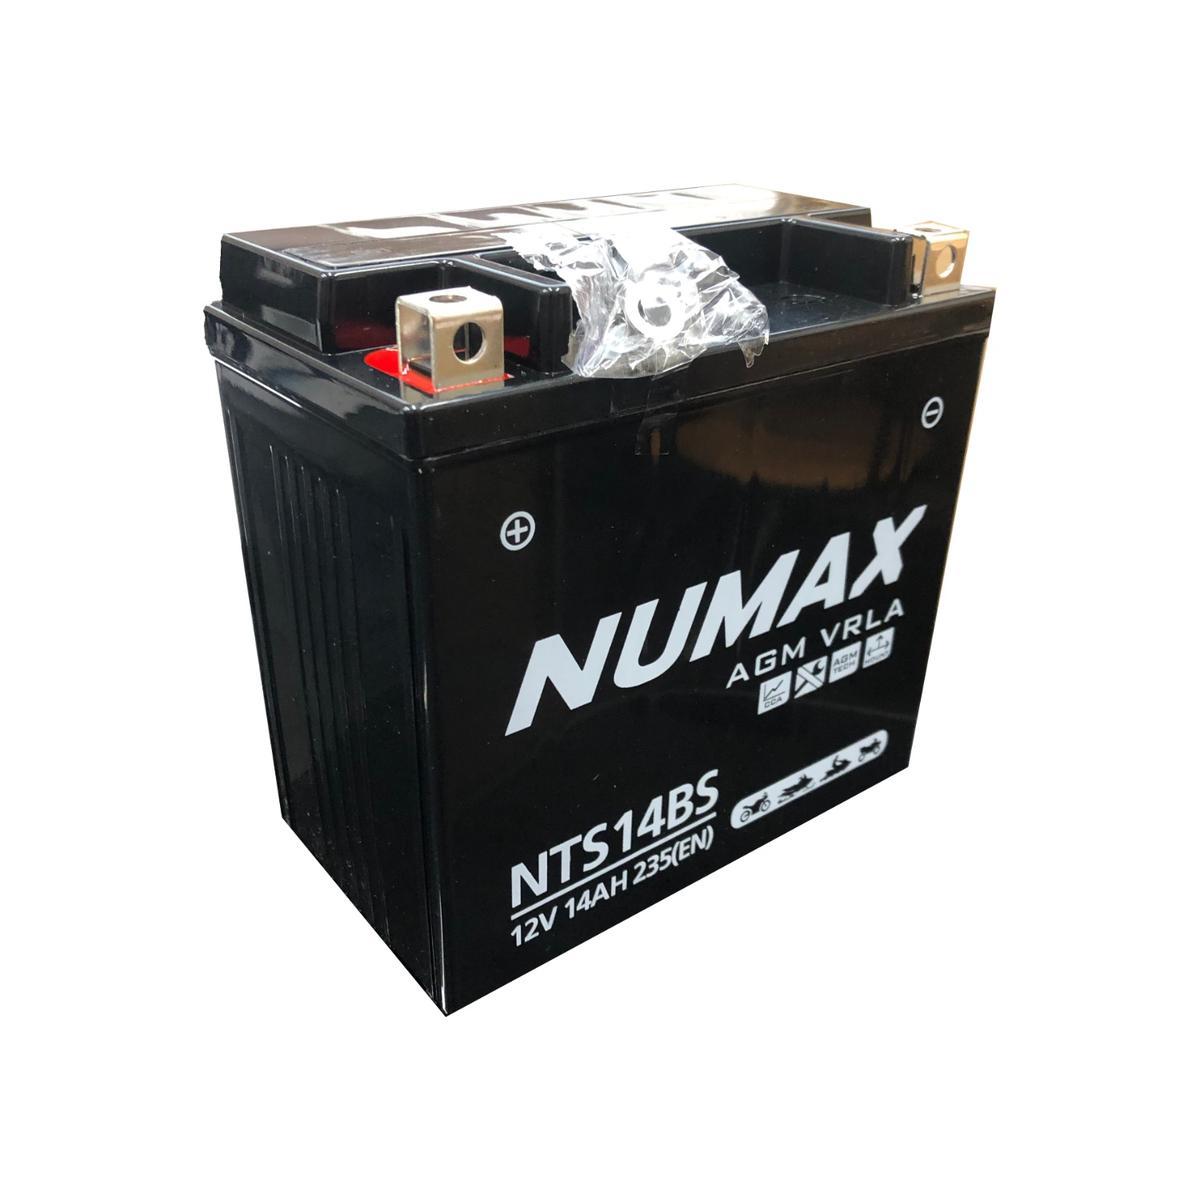 Numax NTS14BS 12v Motorbike Bike Battery HONDA 750cc Deluxe YTX14-4